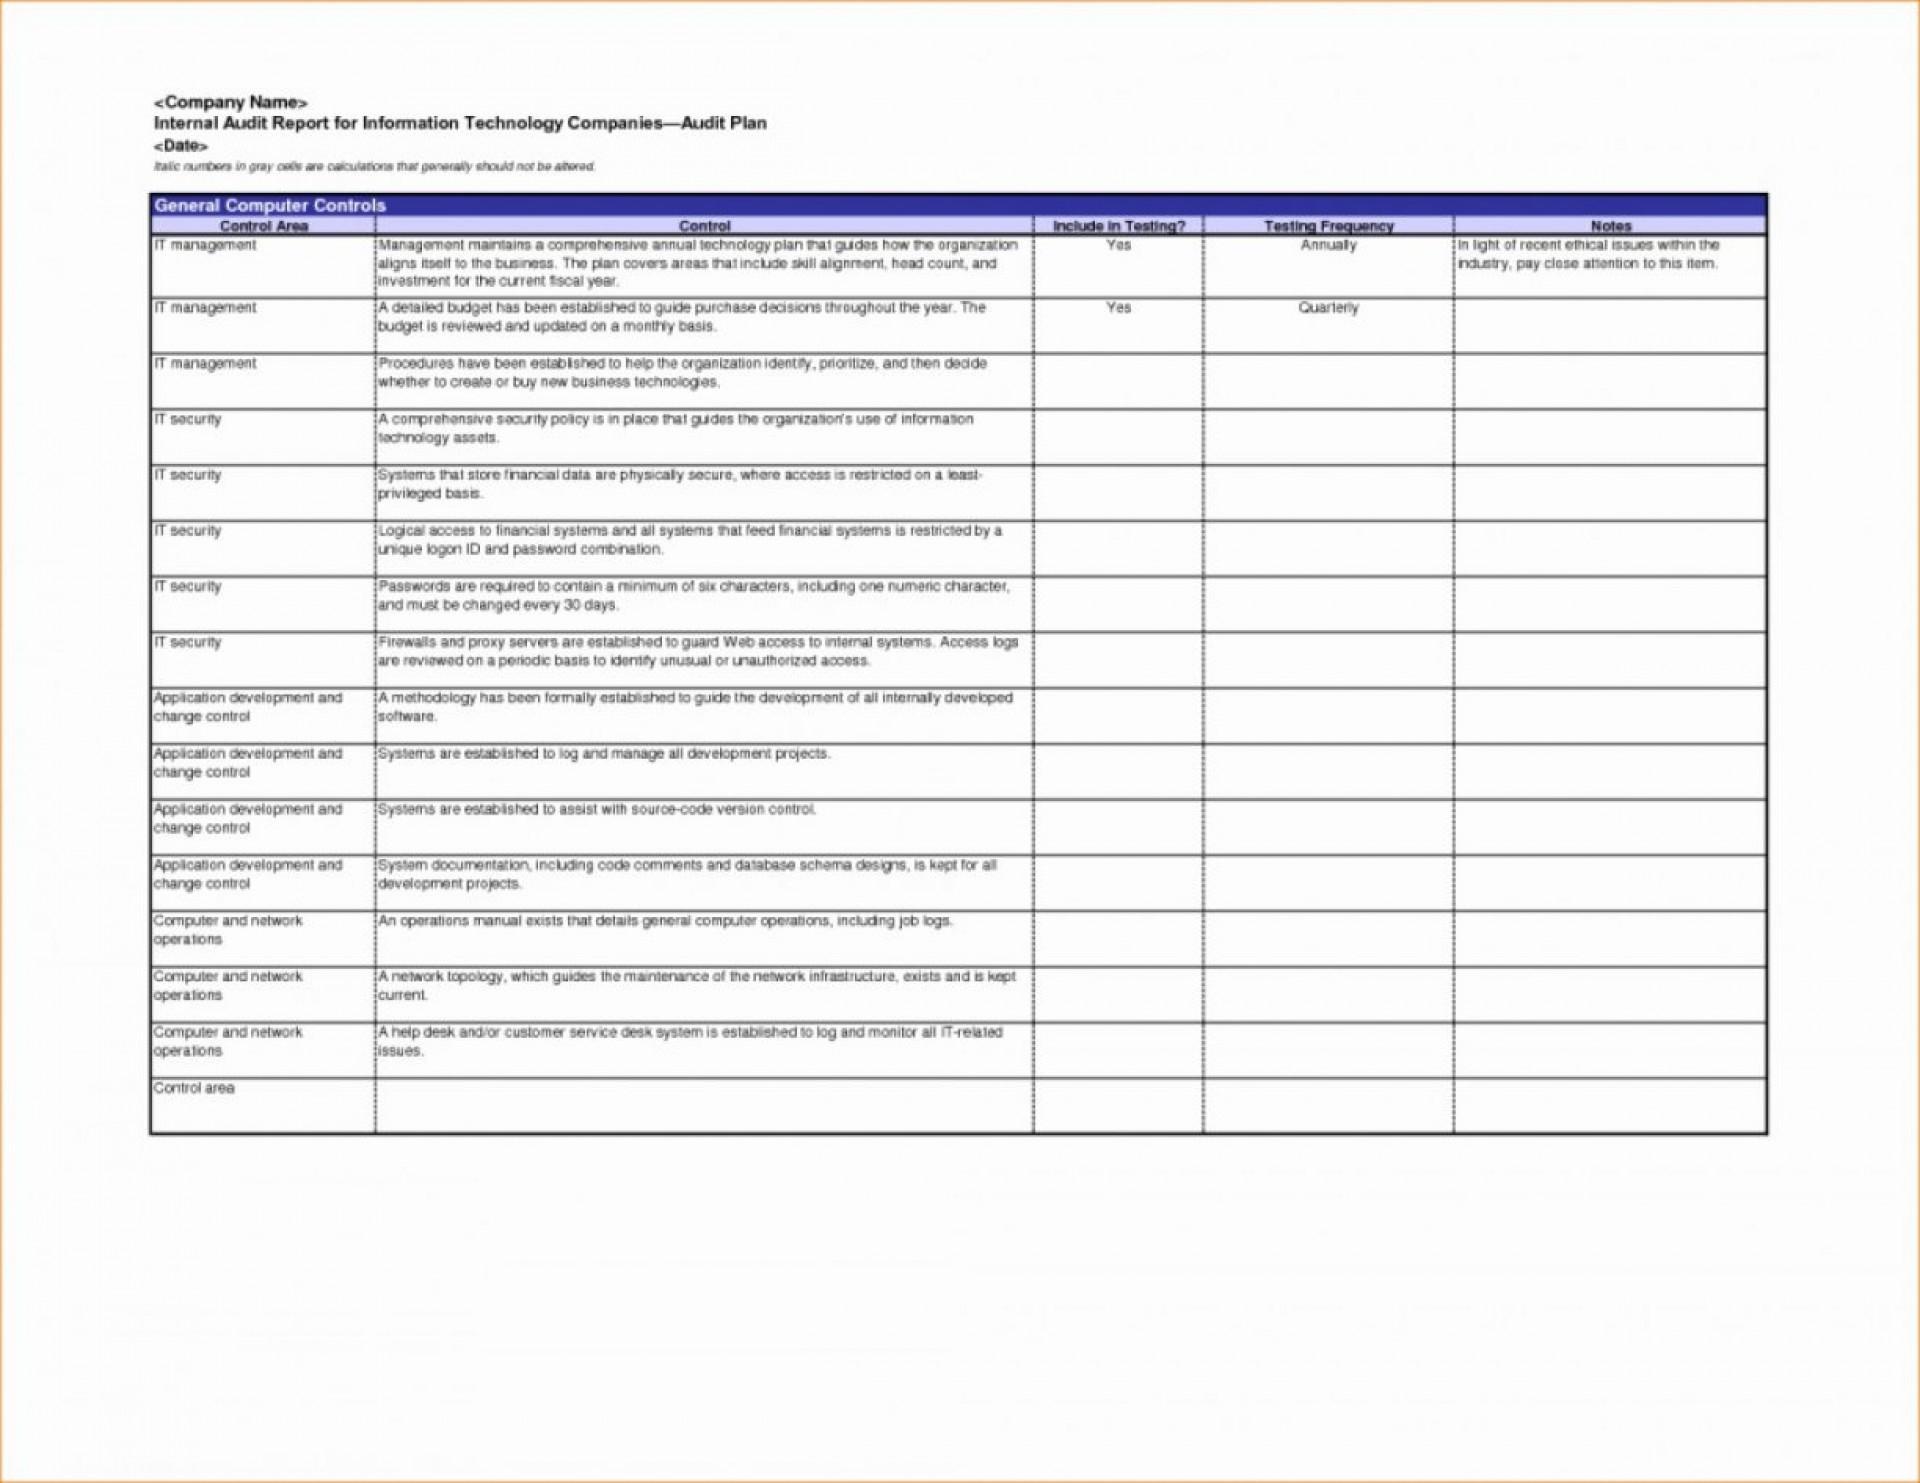 021 Template Internal Audit Report Ideas Reports Unique Regarding Information System Audit Report Template